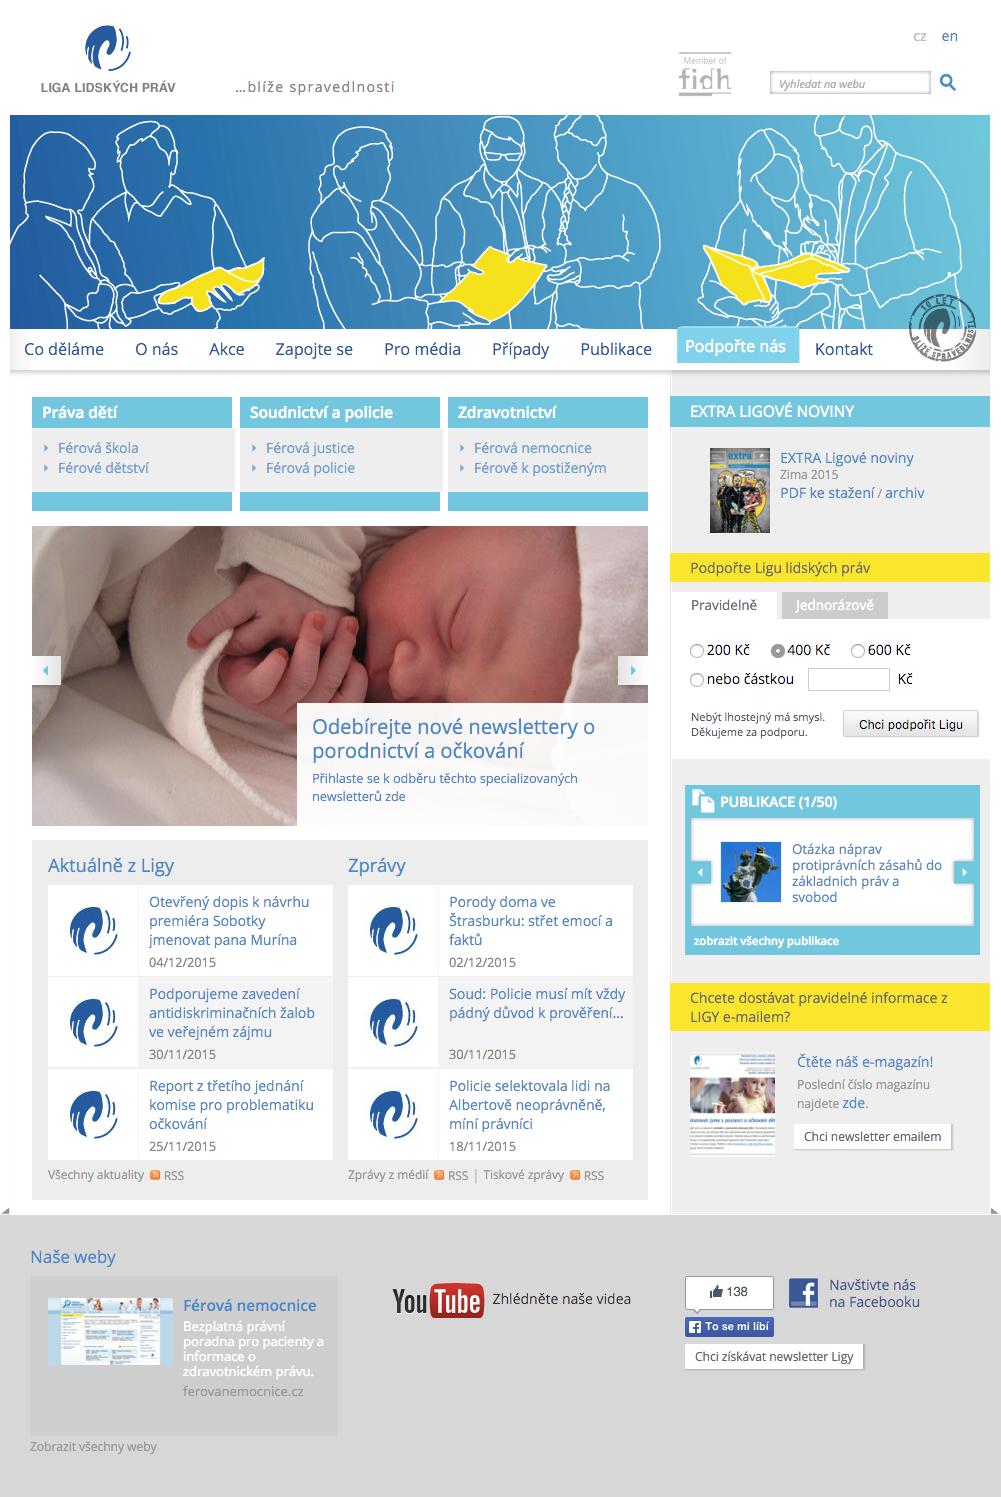 liga-lidskych-prav-brno-webdesign